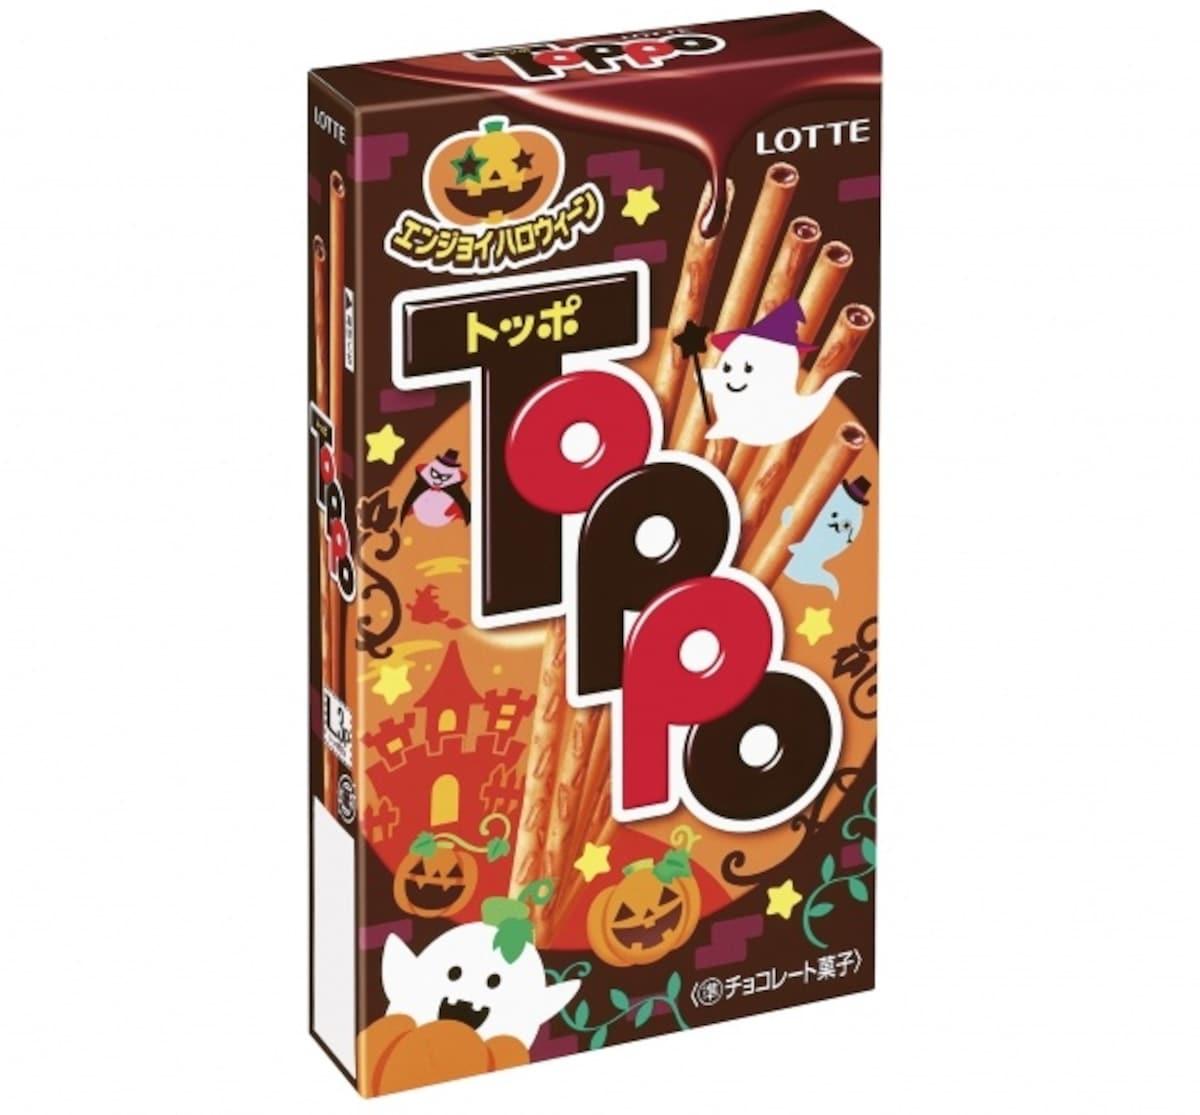 5. Halloween Toppo (Lotte)